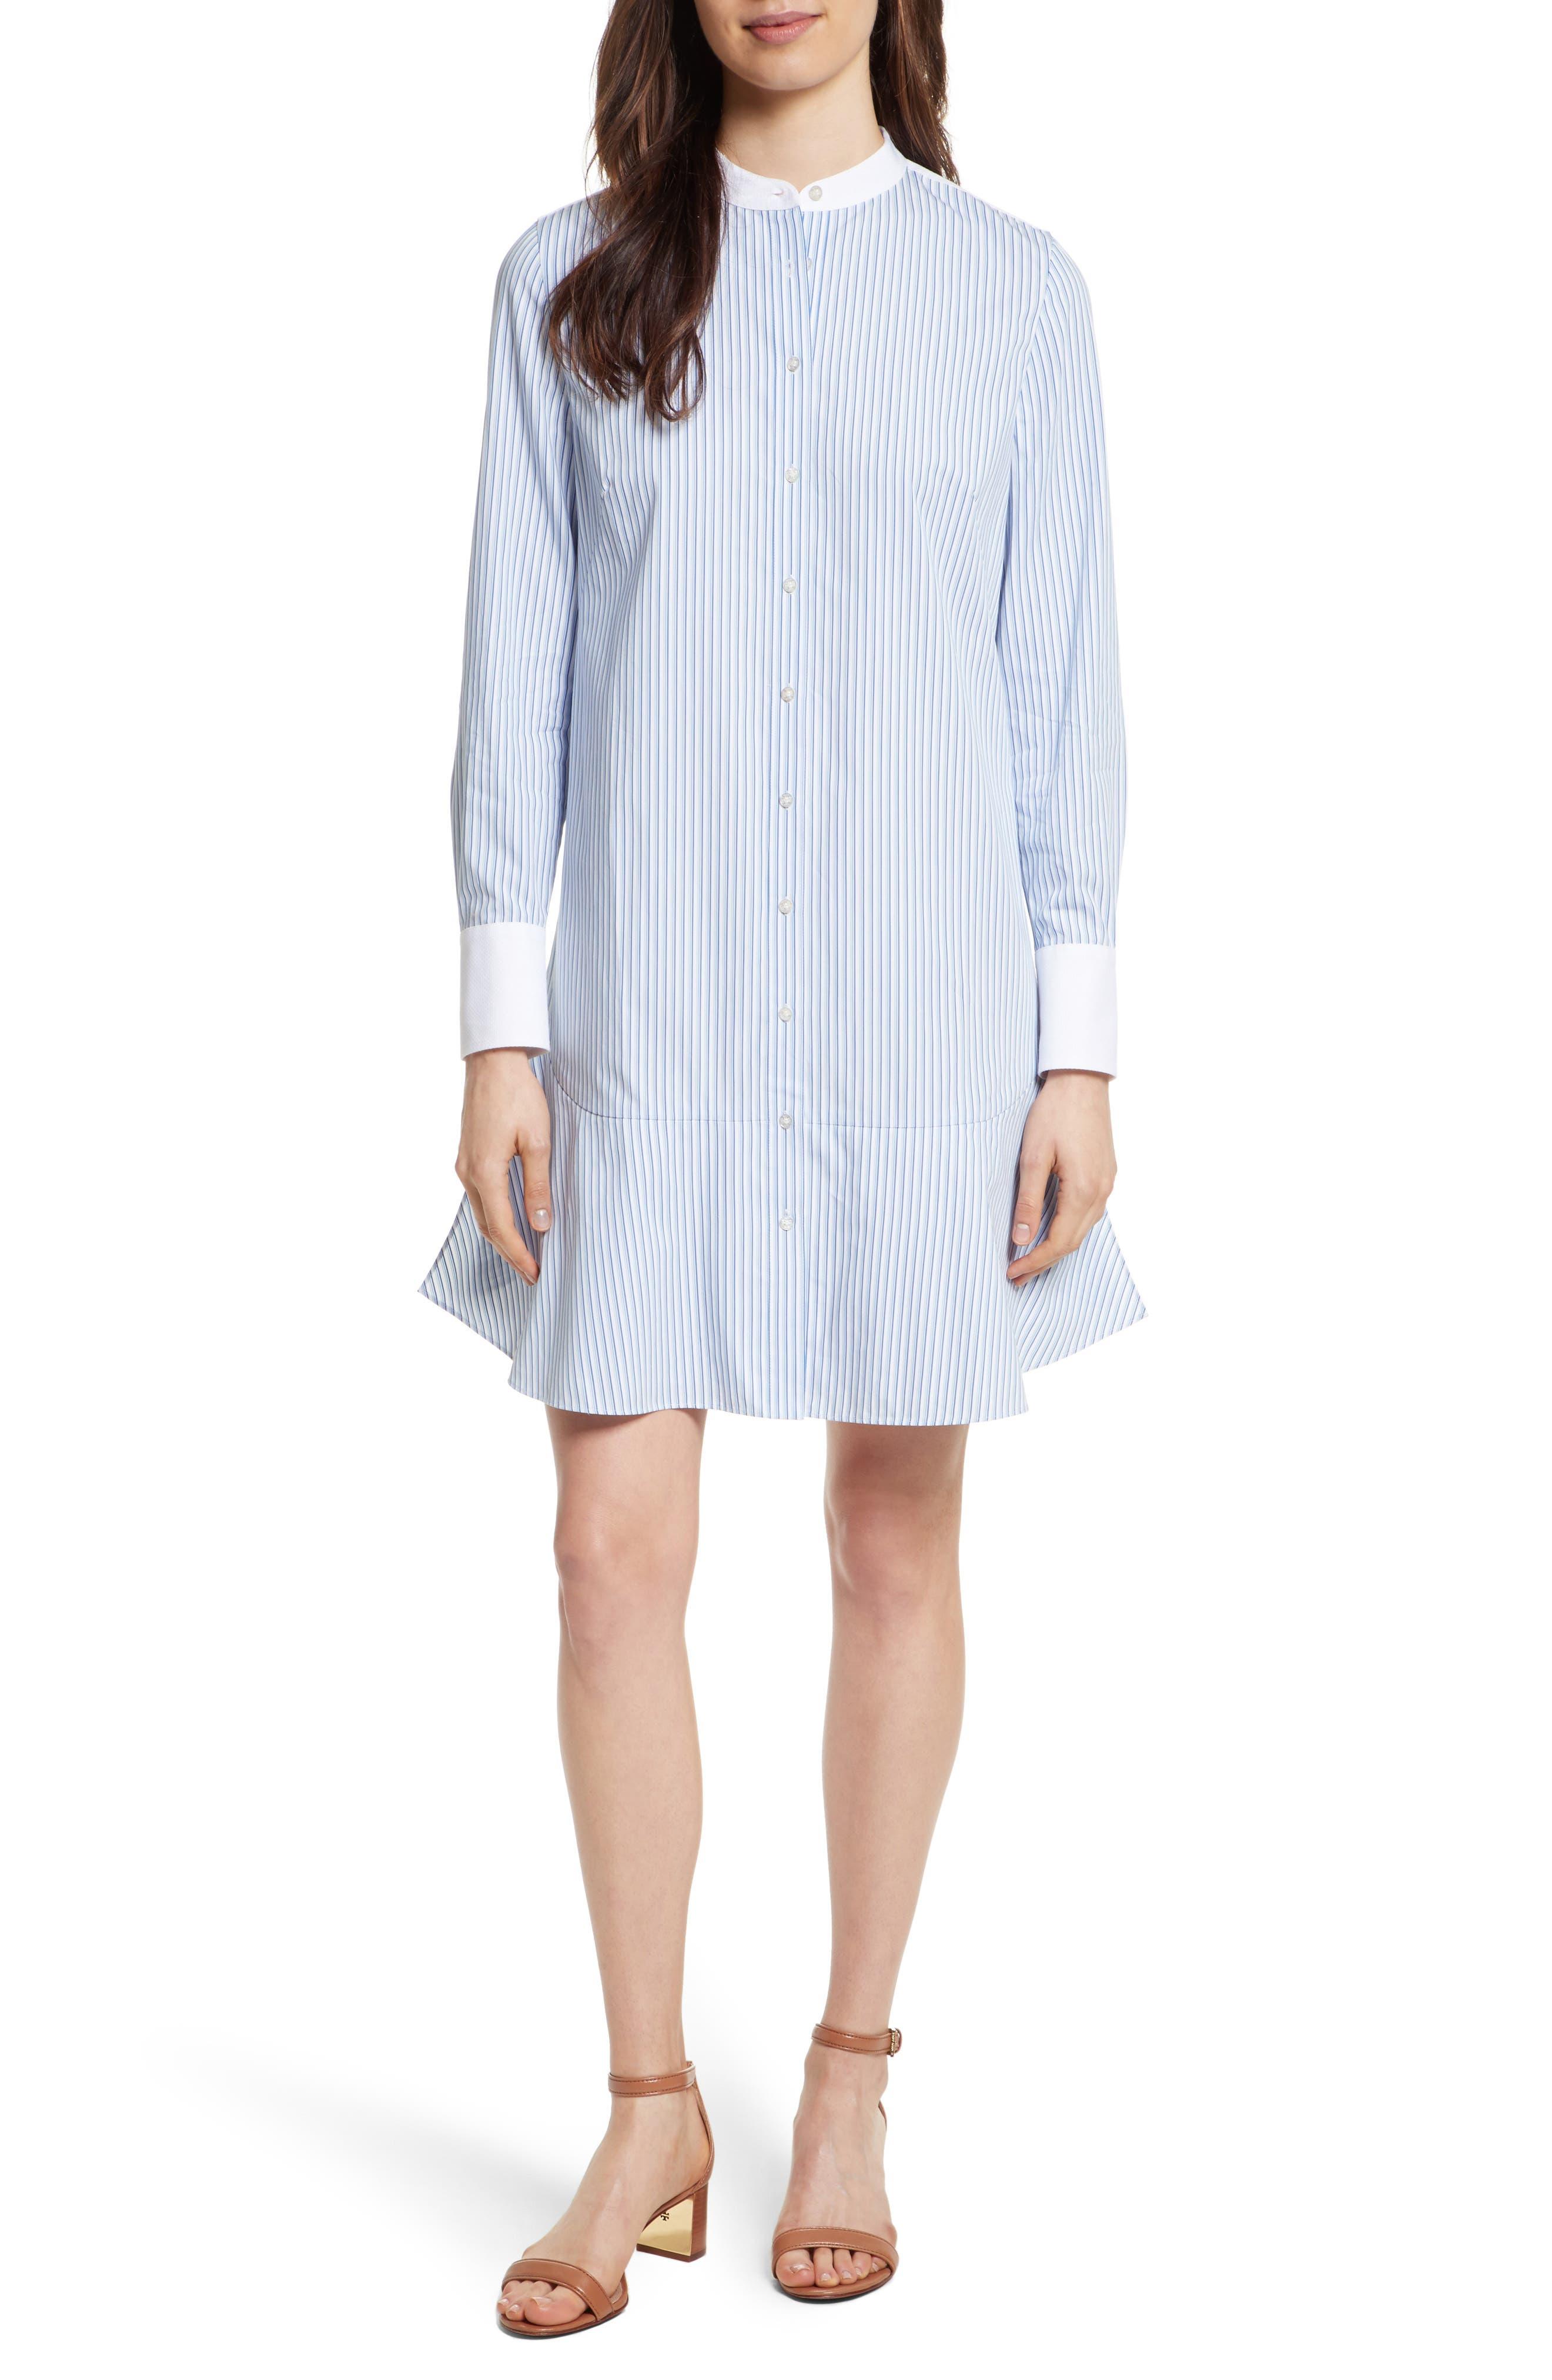 Alternate Image 1 Selected - Tory Burch Cora Stripe Shirtdress